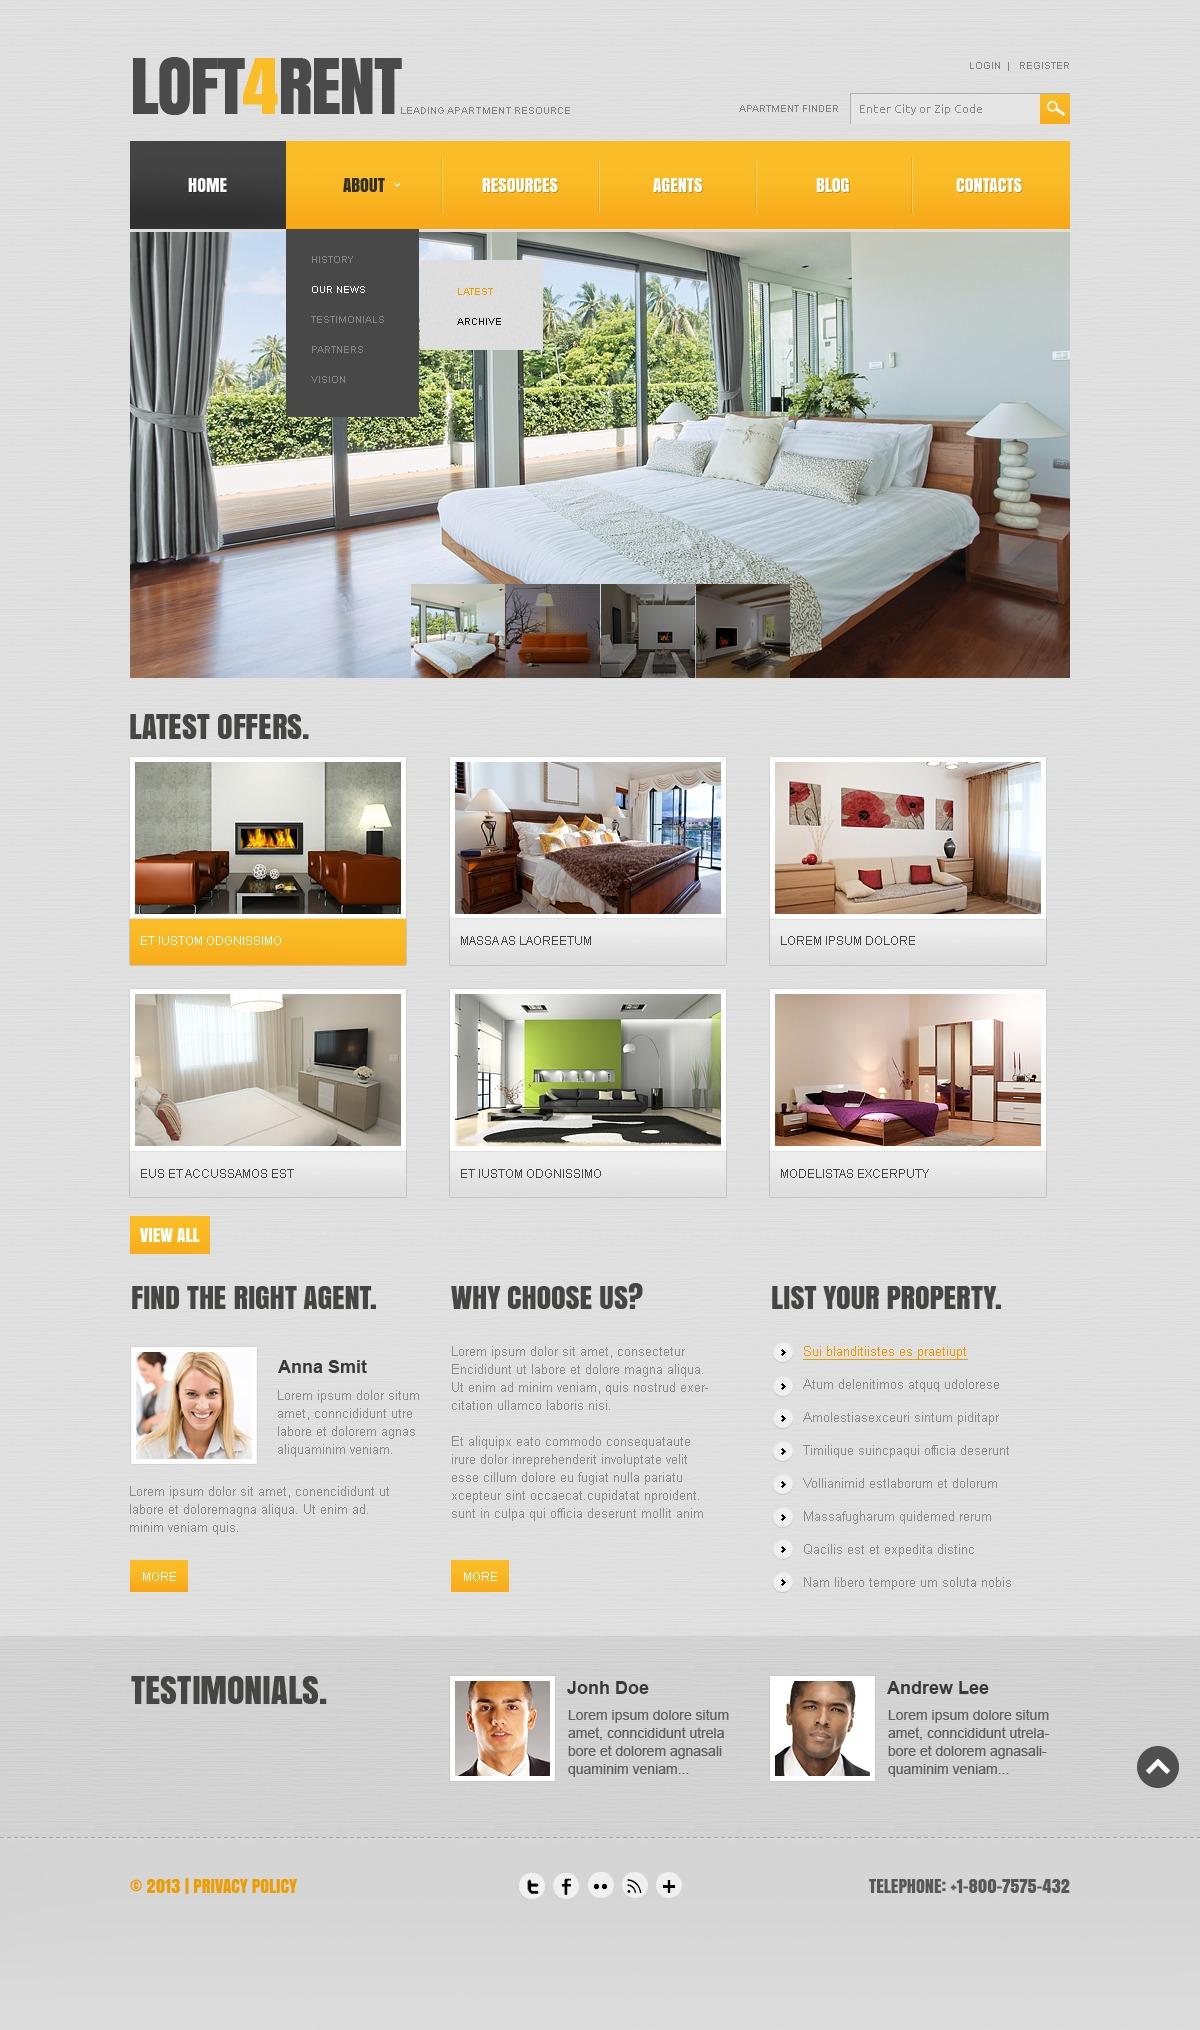 Best Apartment Rental Websites